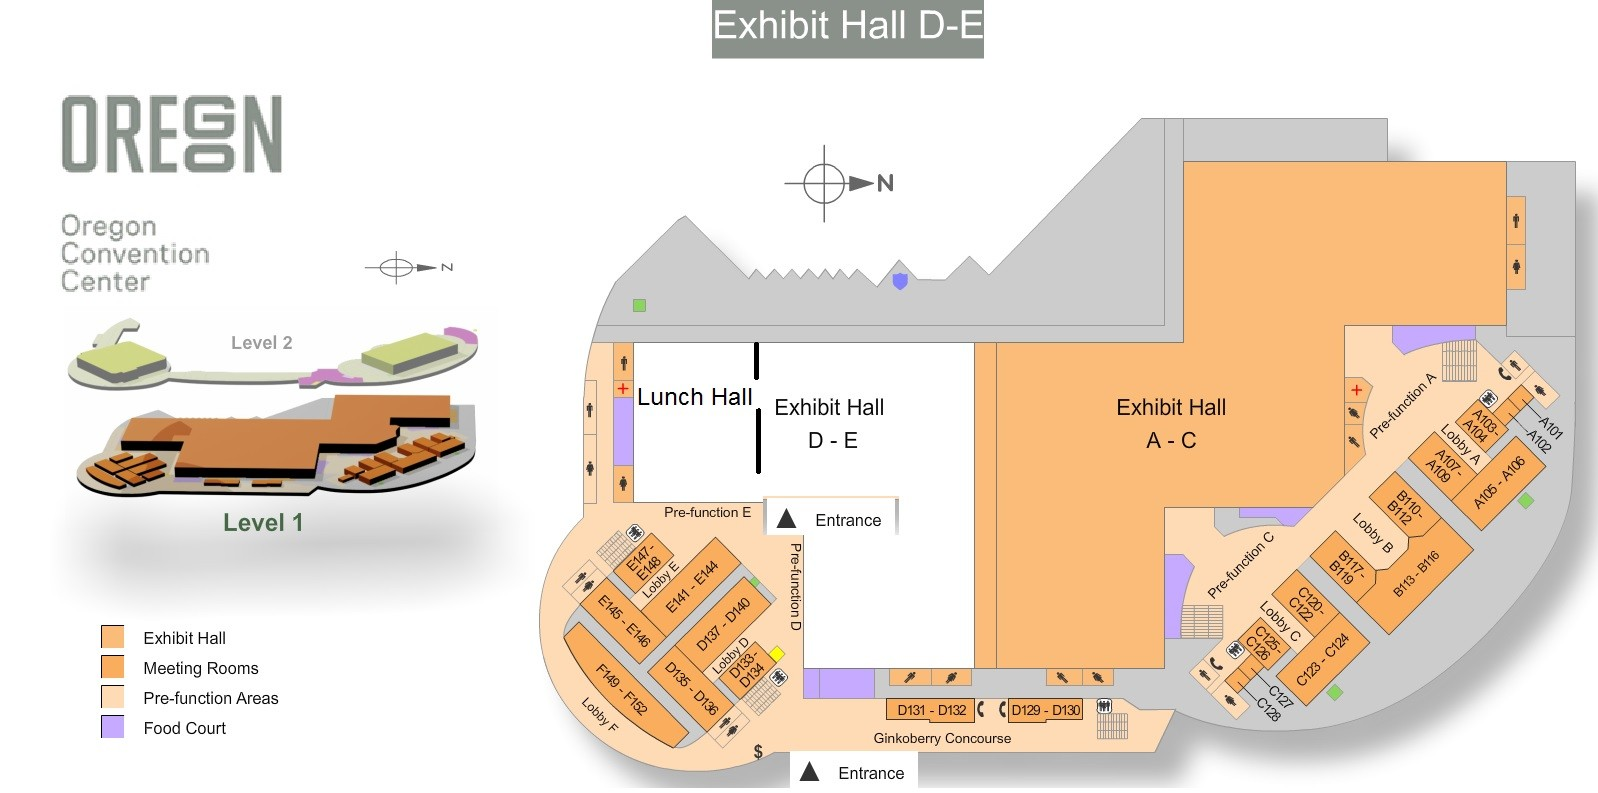 OCC Exhibit Halls E and D